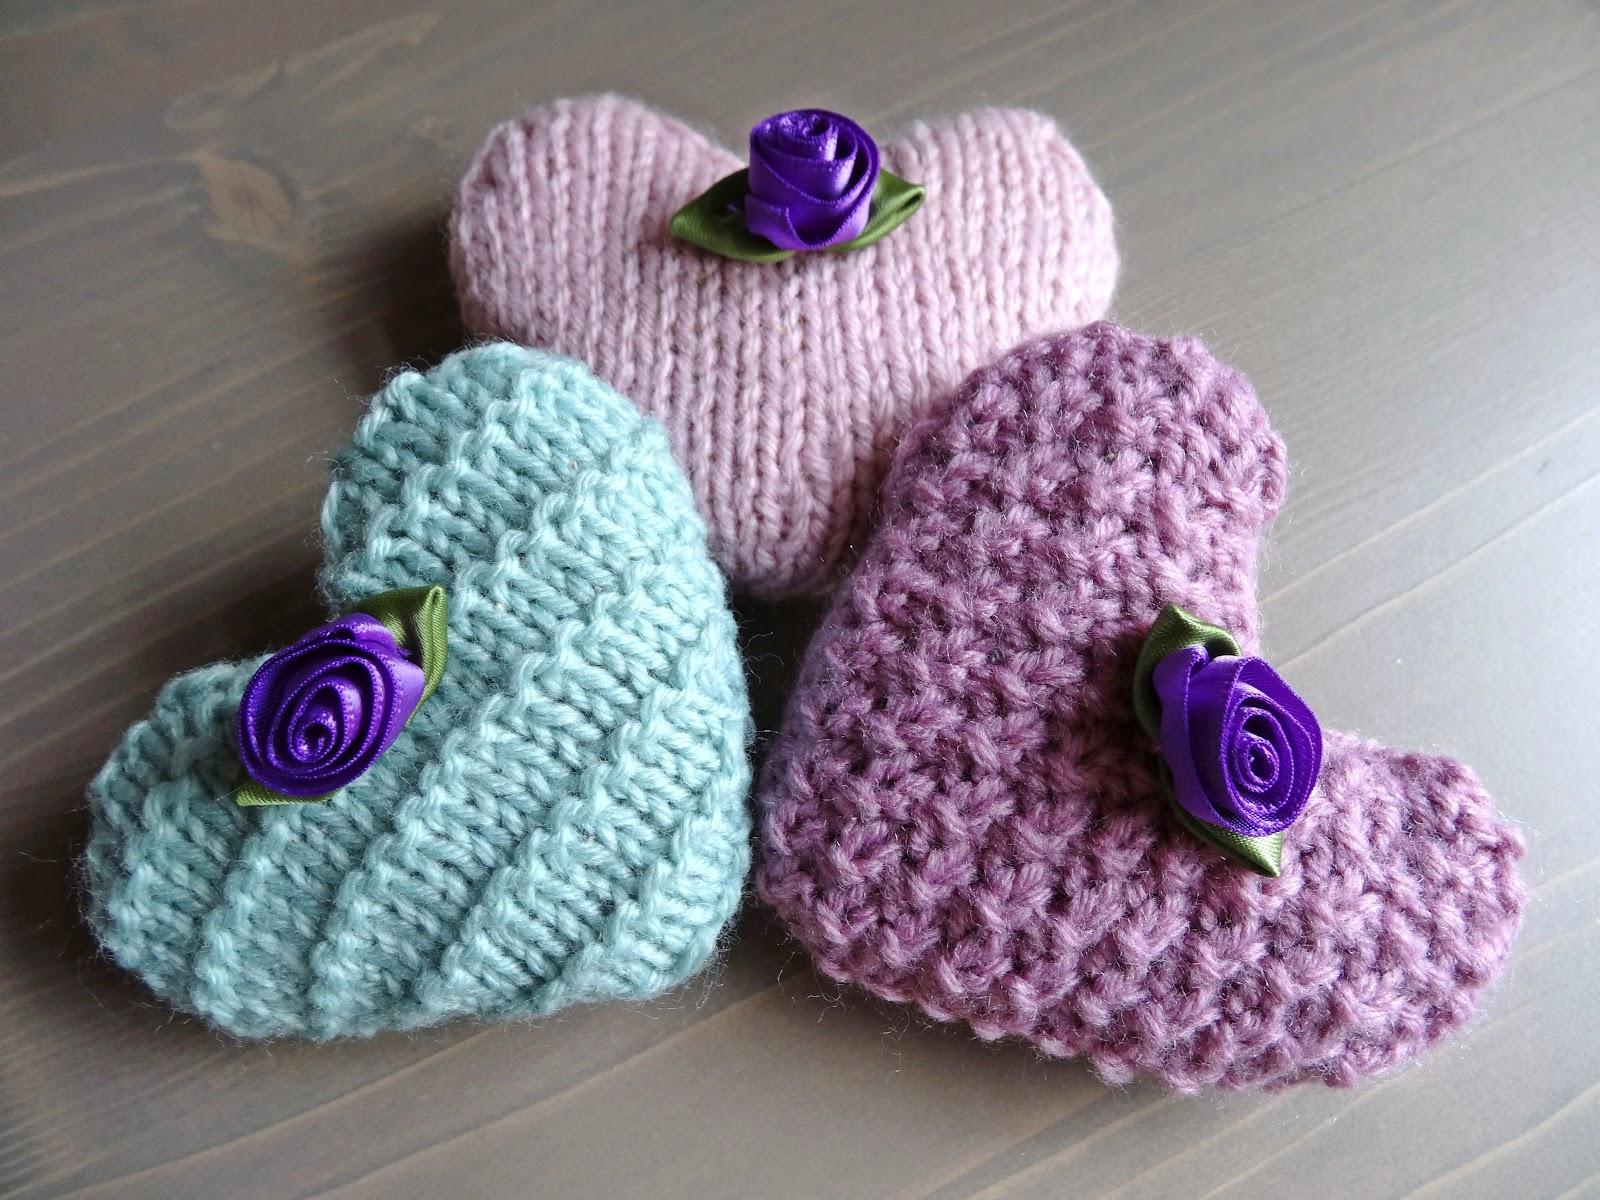 Knitting Stitch M1f : The Snail Garden: Lavender Hearts